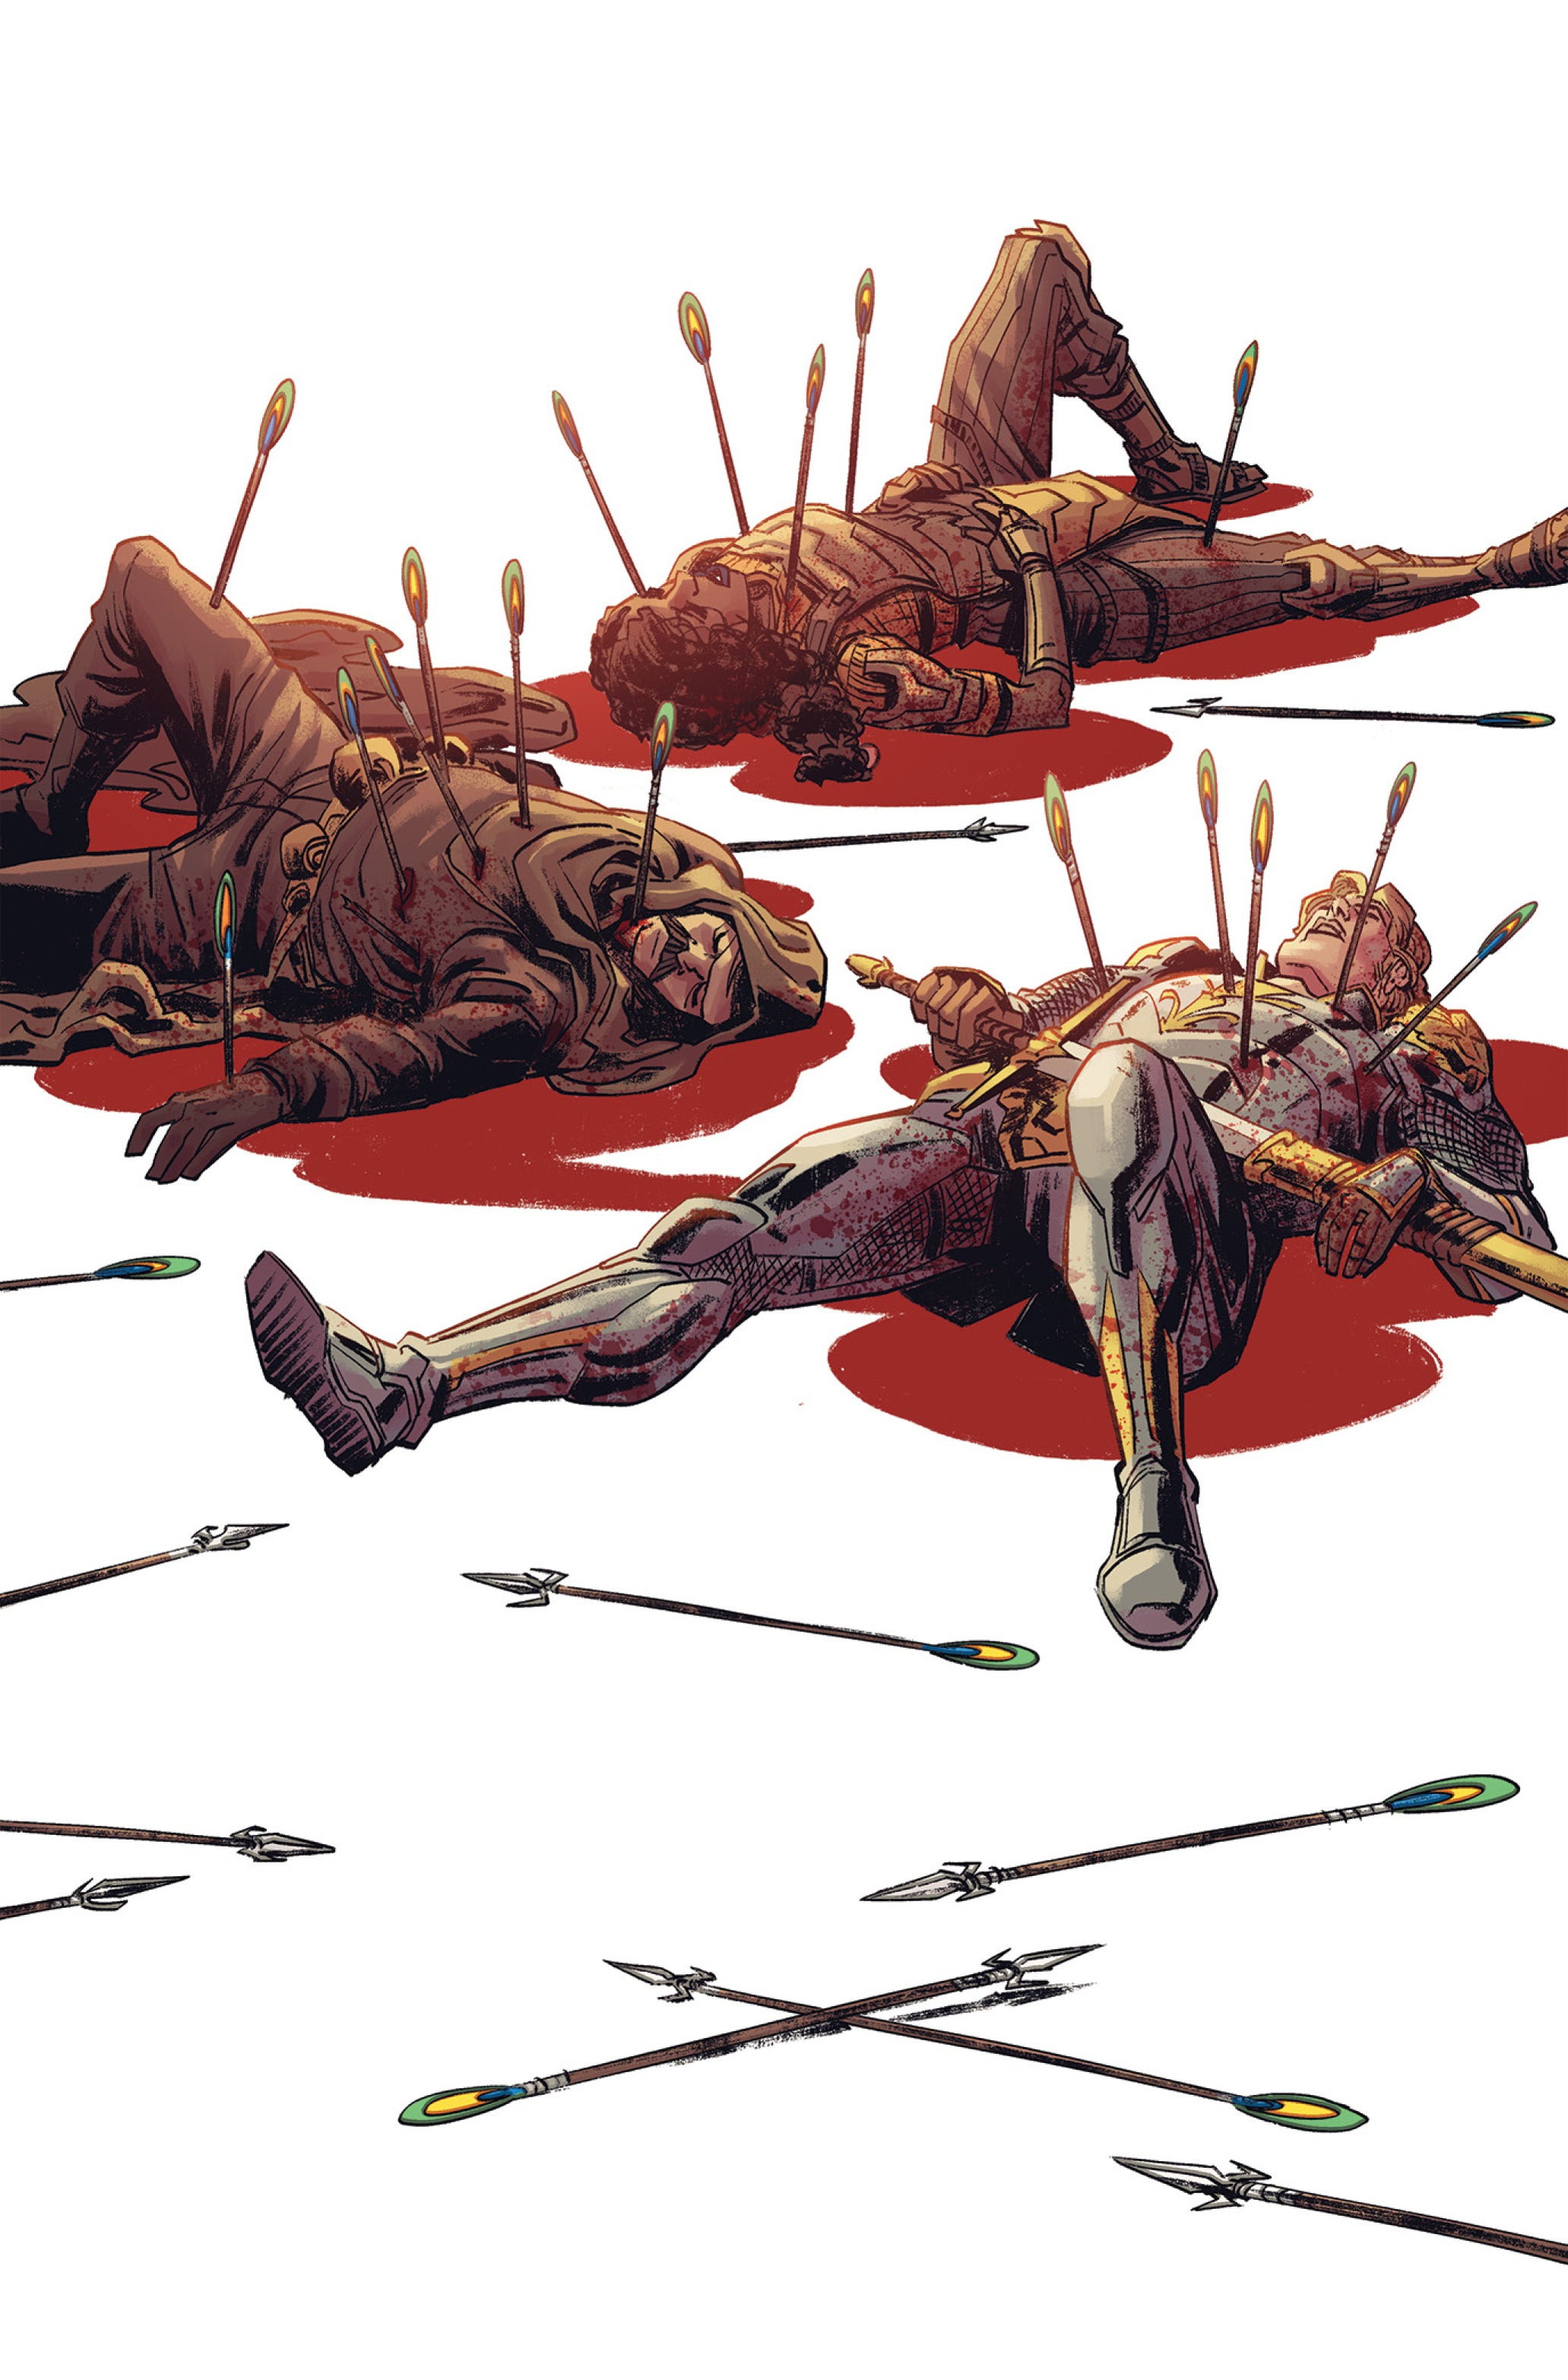 Image: Eduardo Ferigato and Marcelo Costa, Image Comics